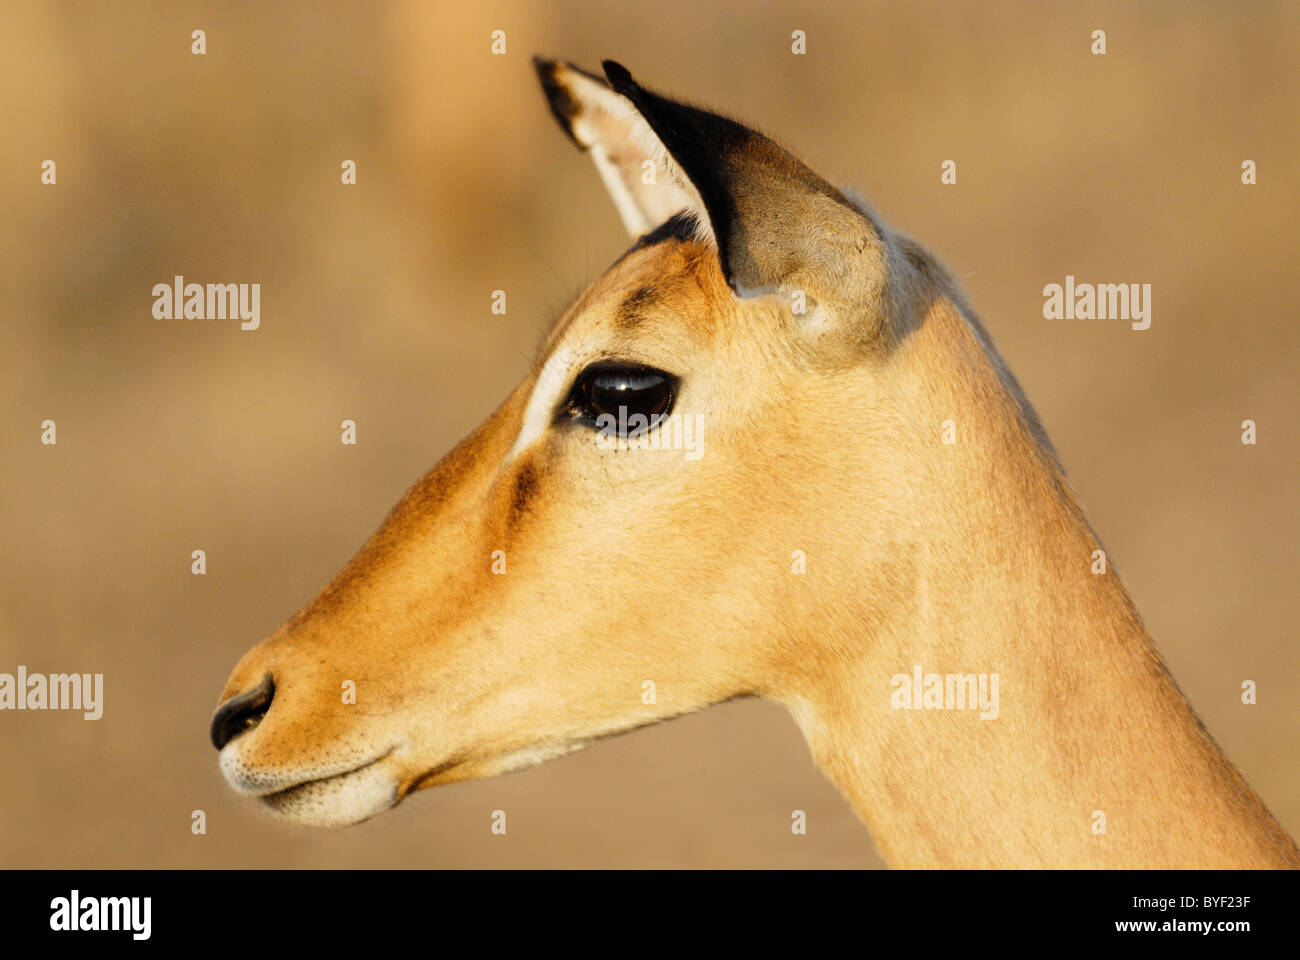 Female Impala in Kruger National Park, South Africa - Stock Image